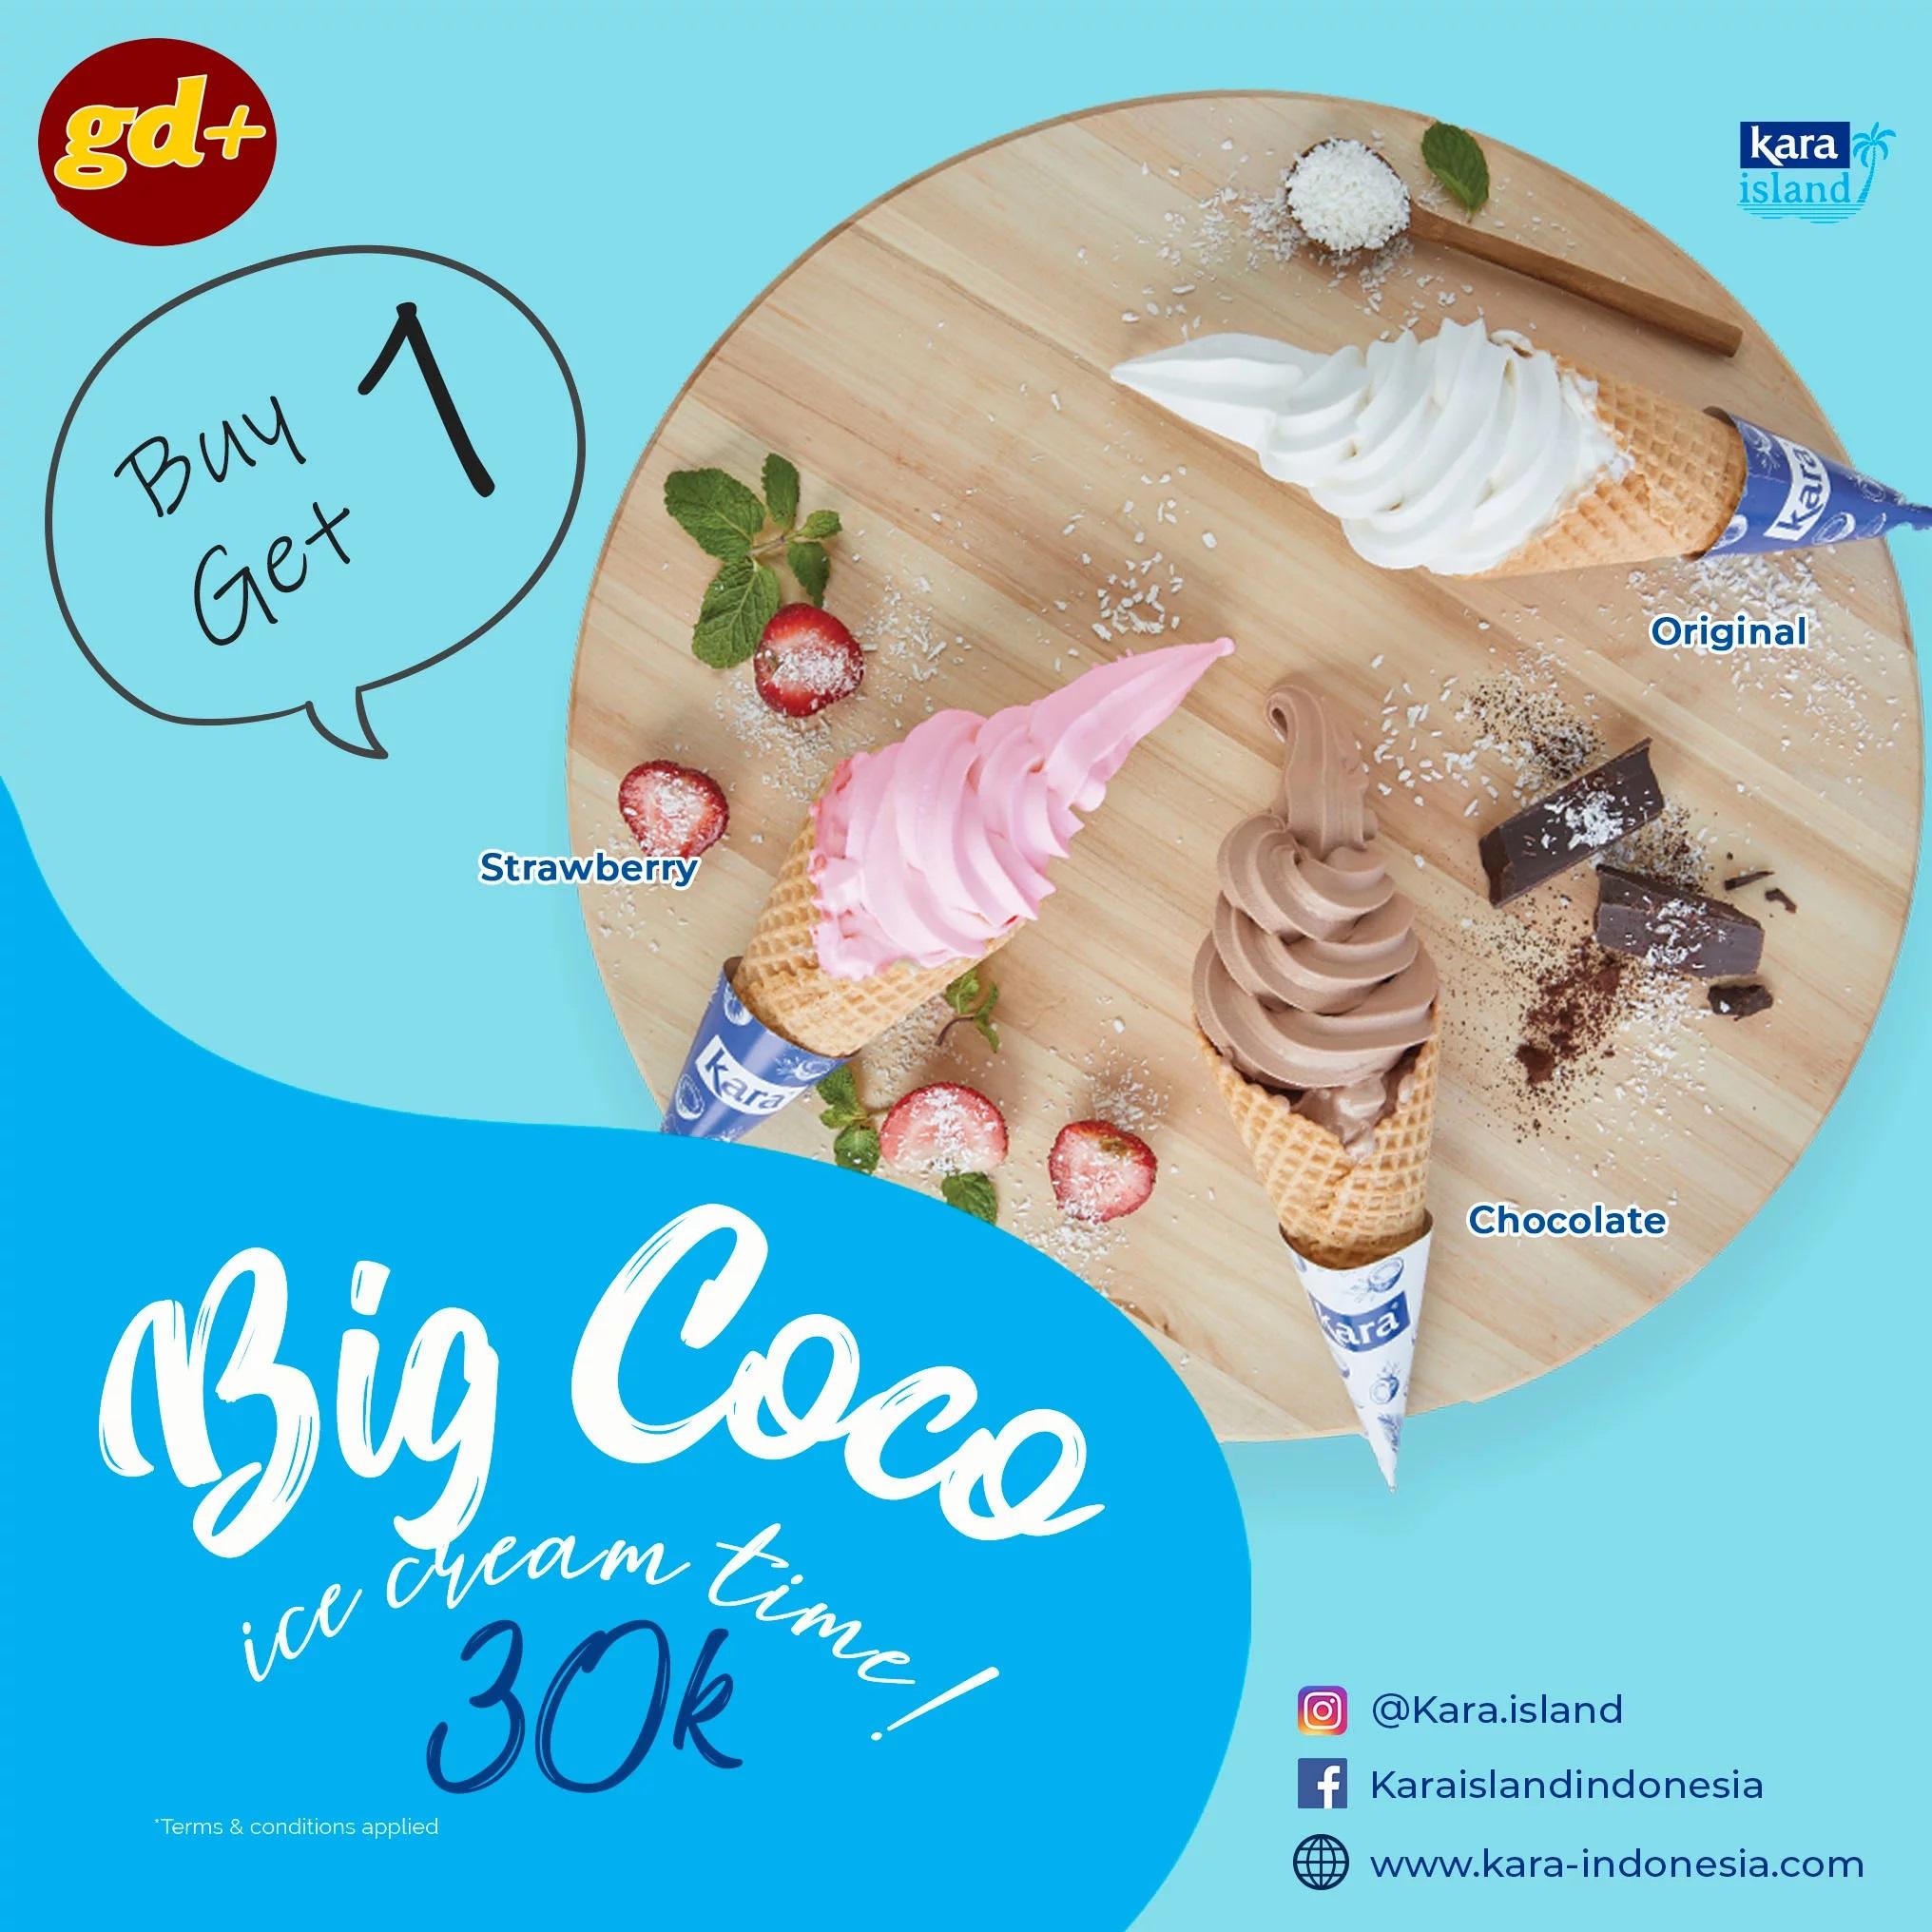 Promo Kara Island Spesial GD+, BUY 1 GET 1 FREE Ice Cream Big Coco